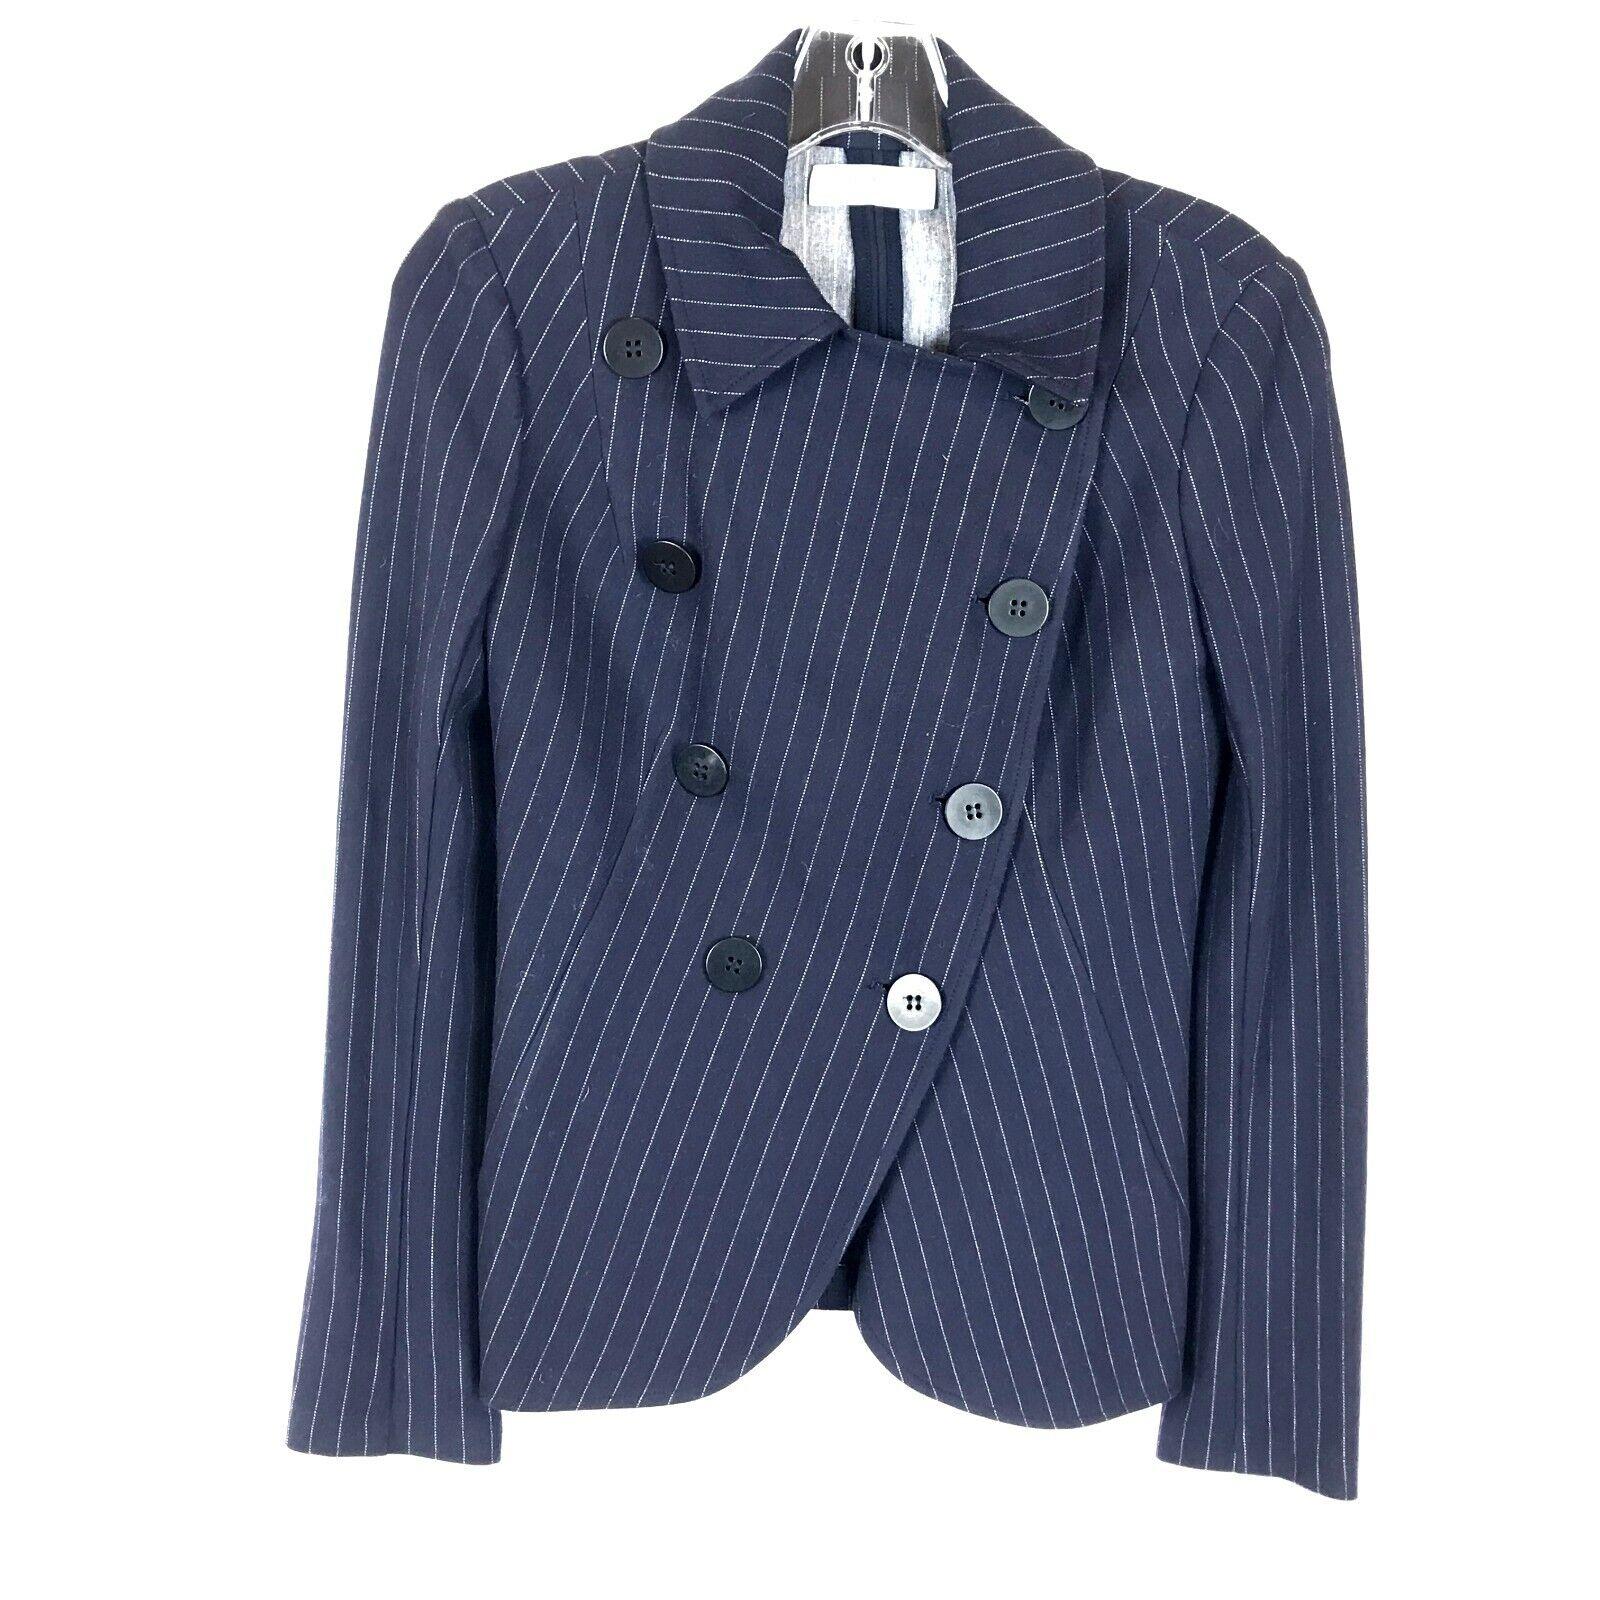 Womens Size XS Nordstrom Bailey 44 Navy Striped Asymmetric Button Blazer Jacket